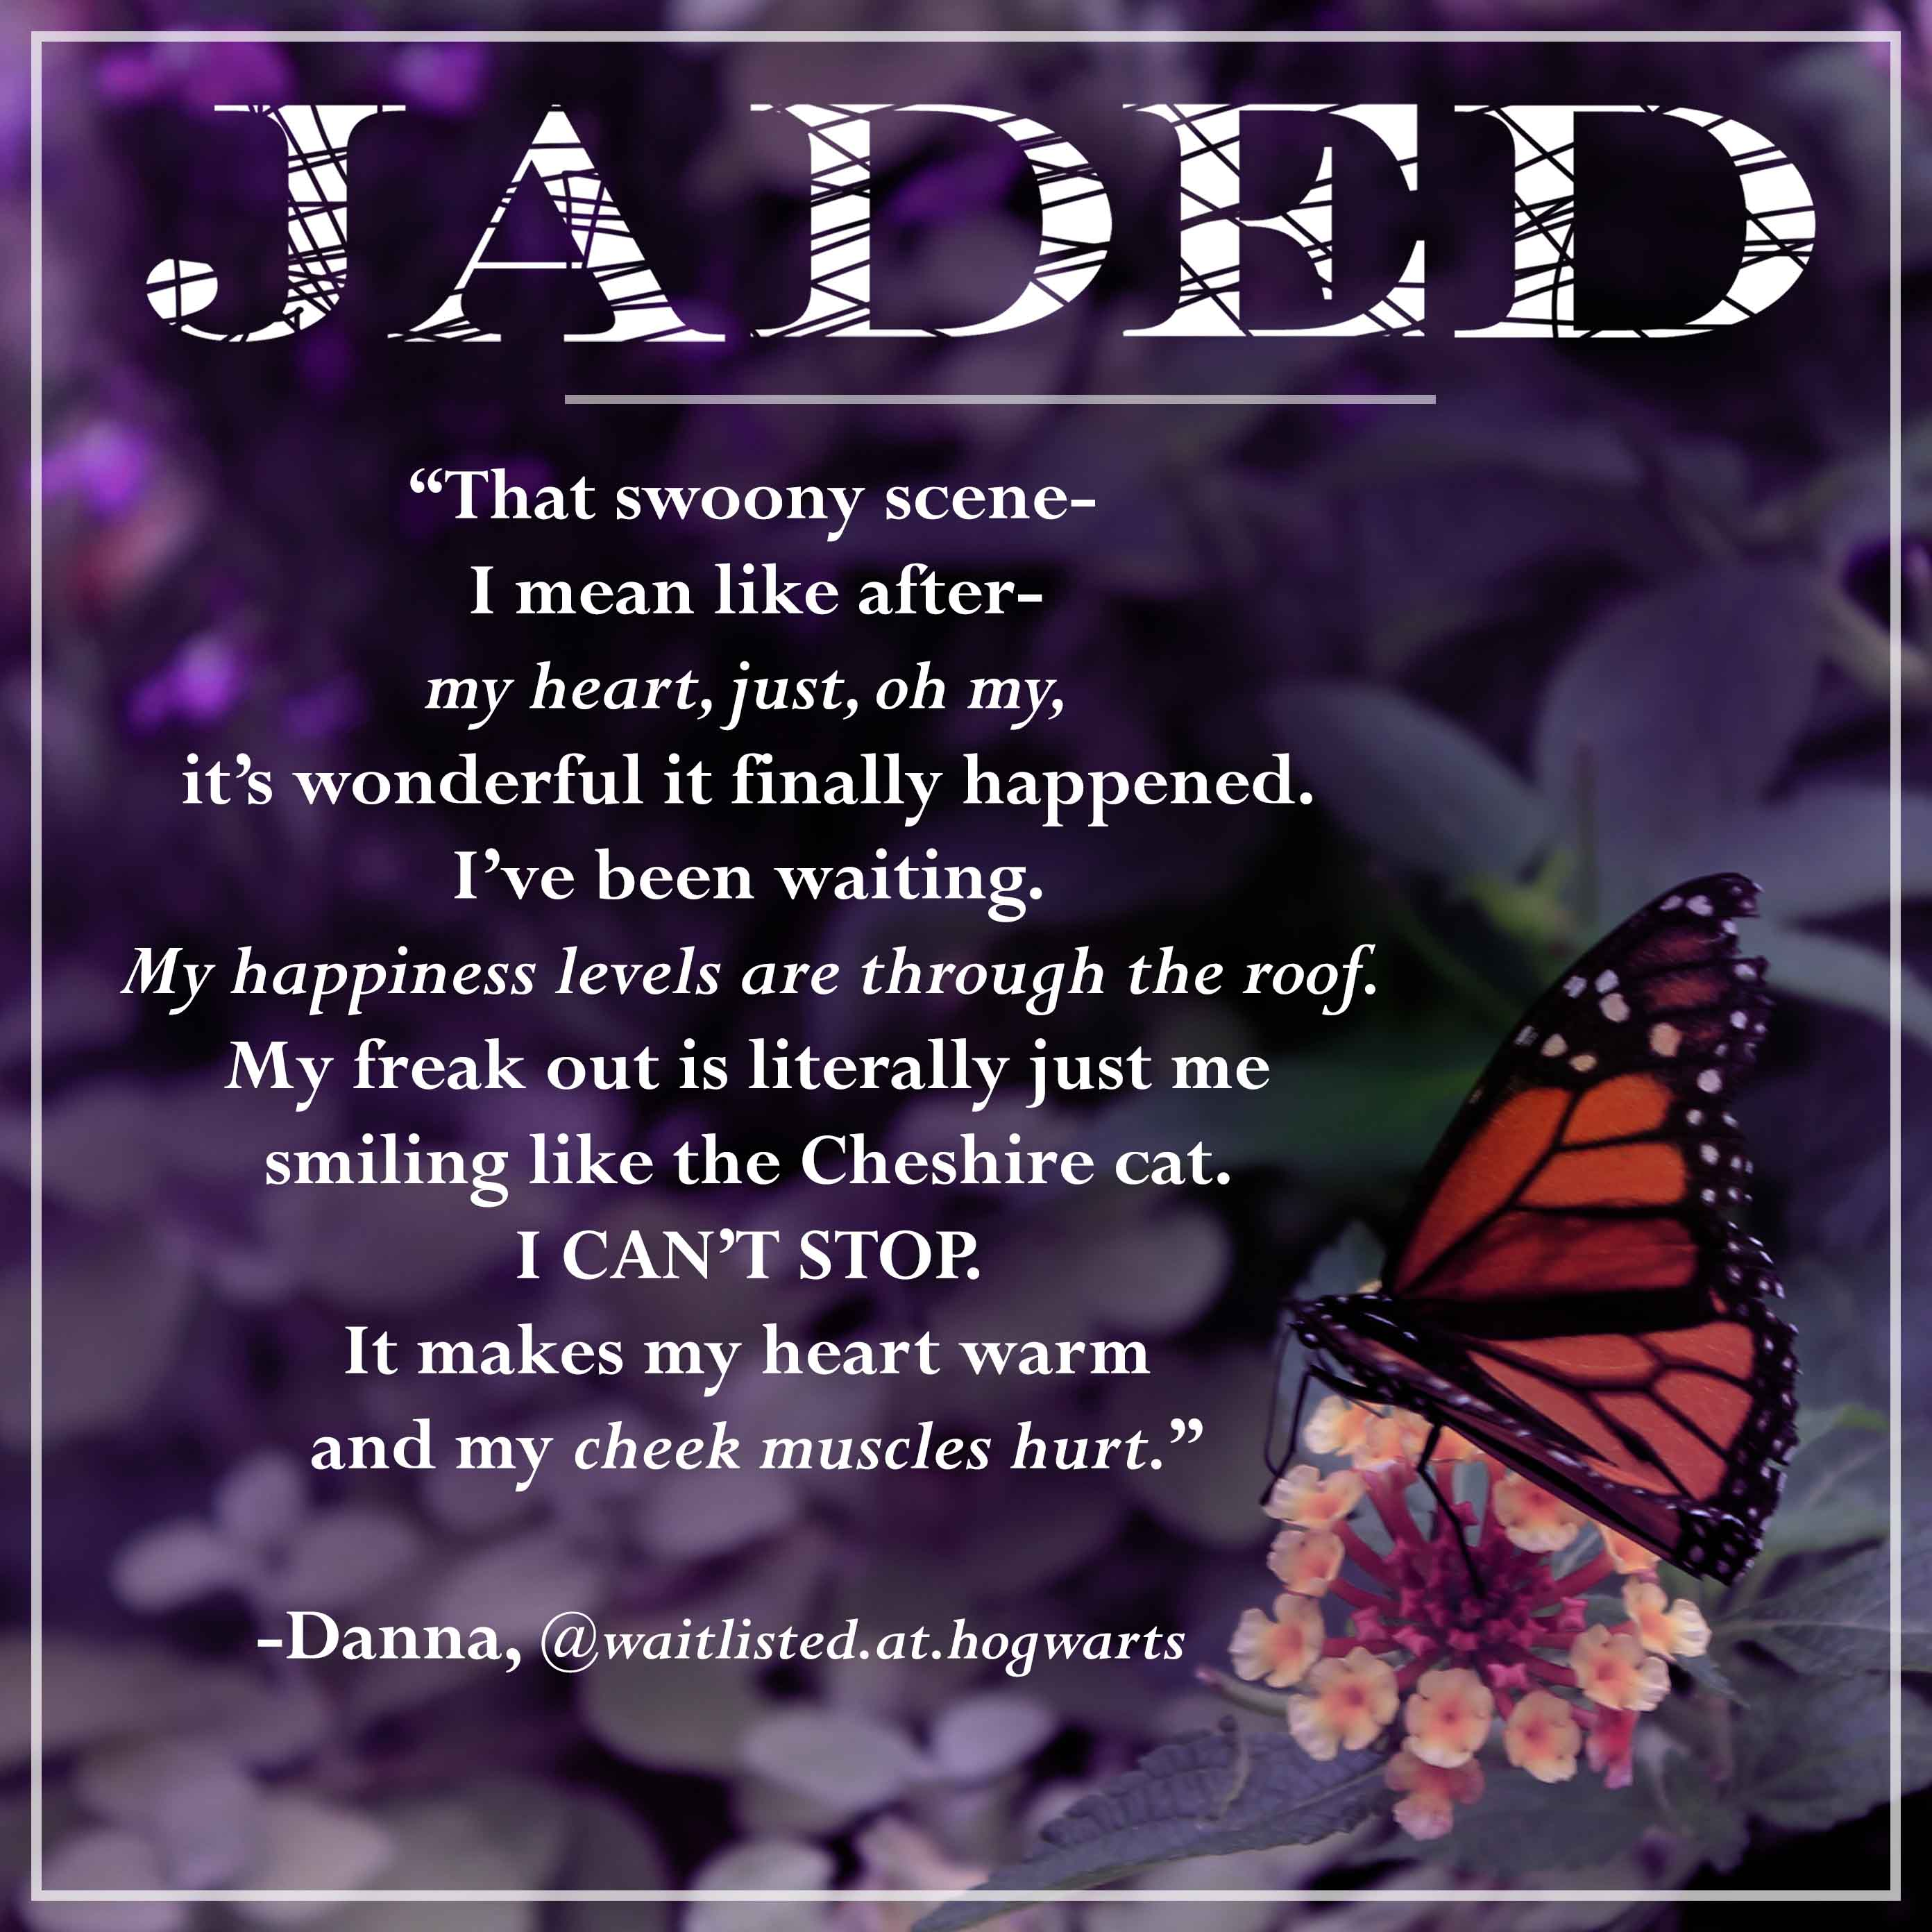 jaded fan quote-danna 2